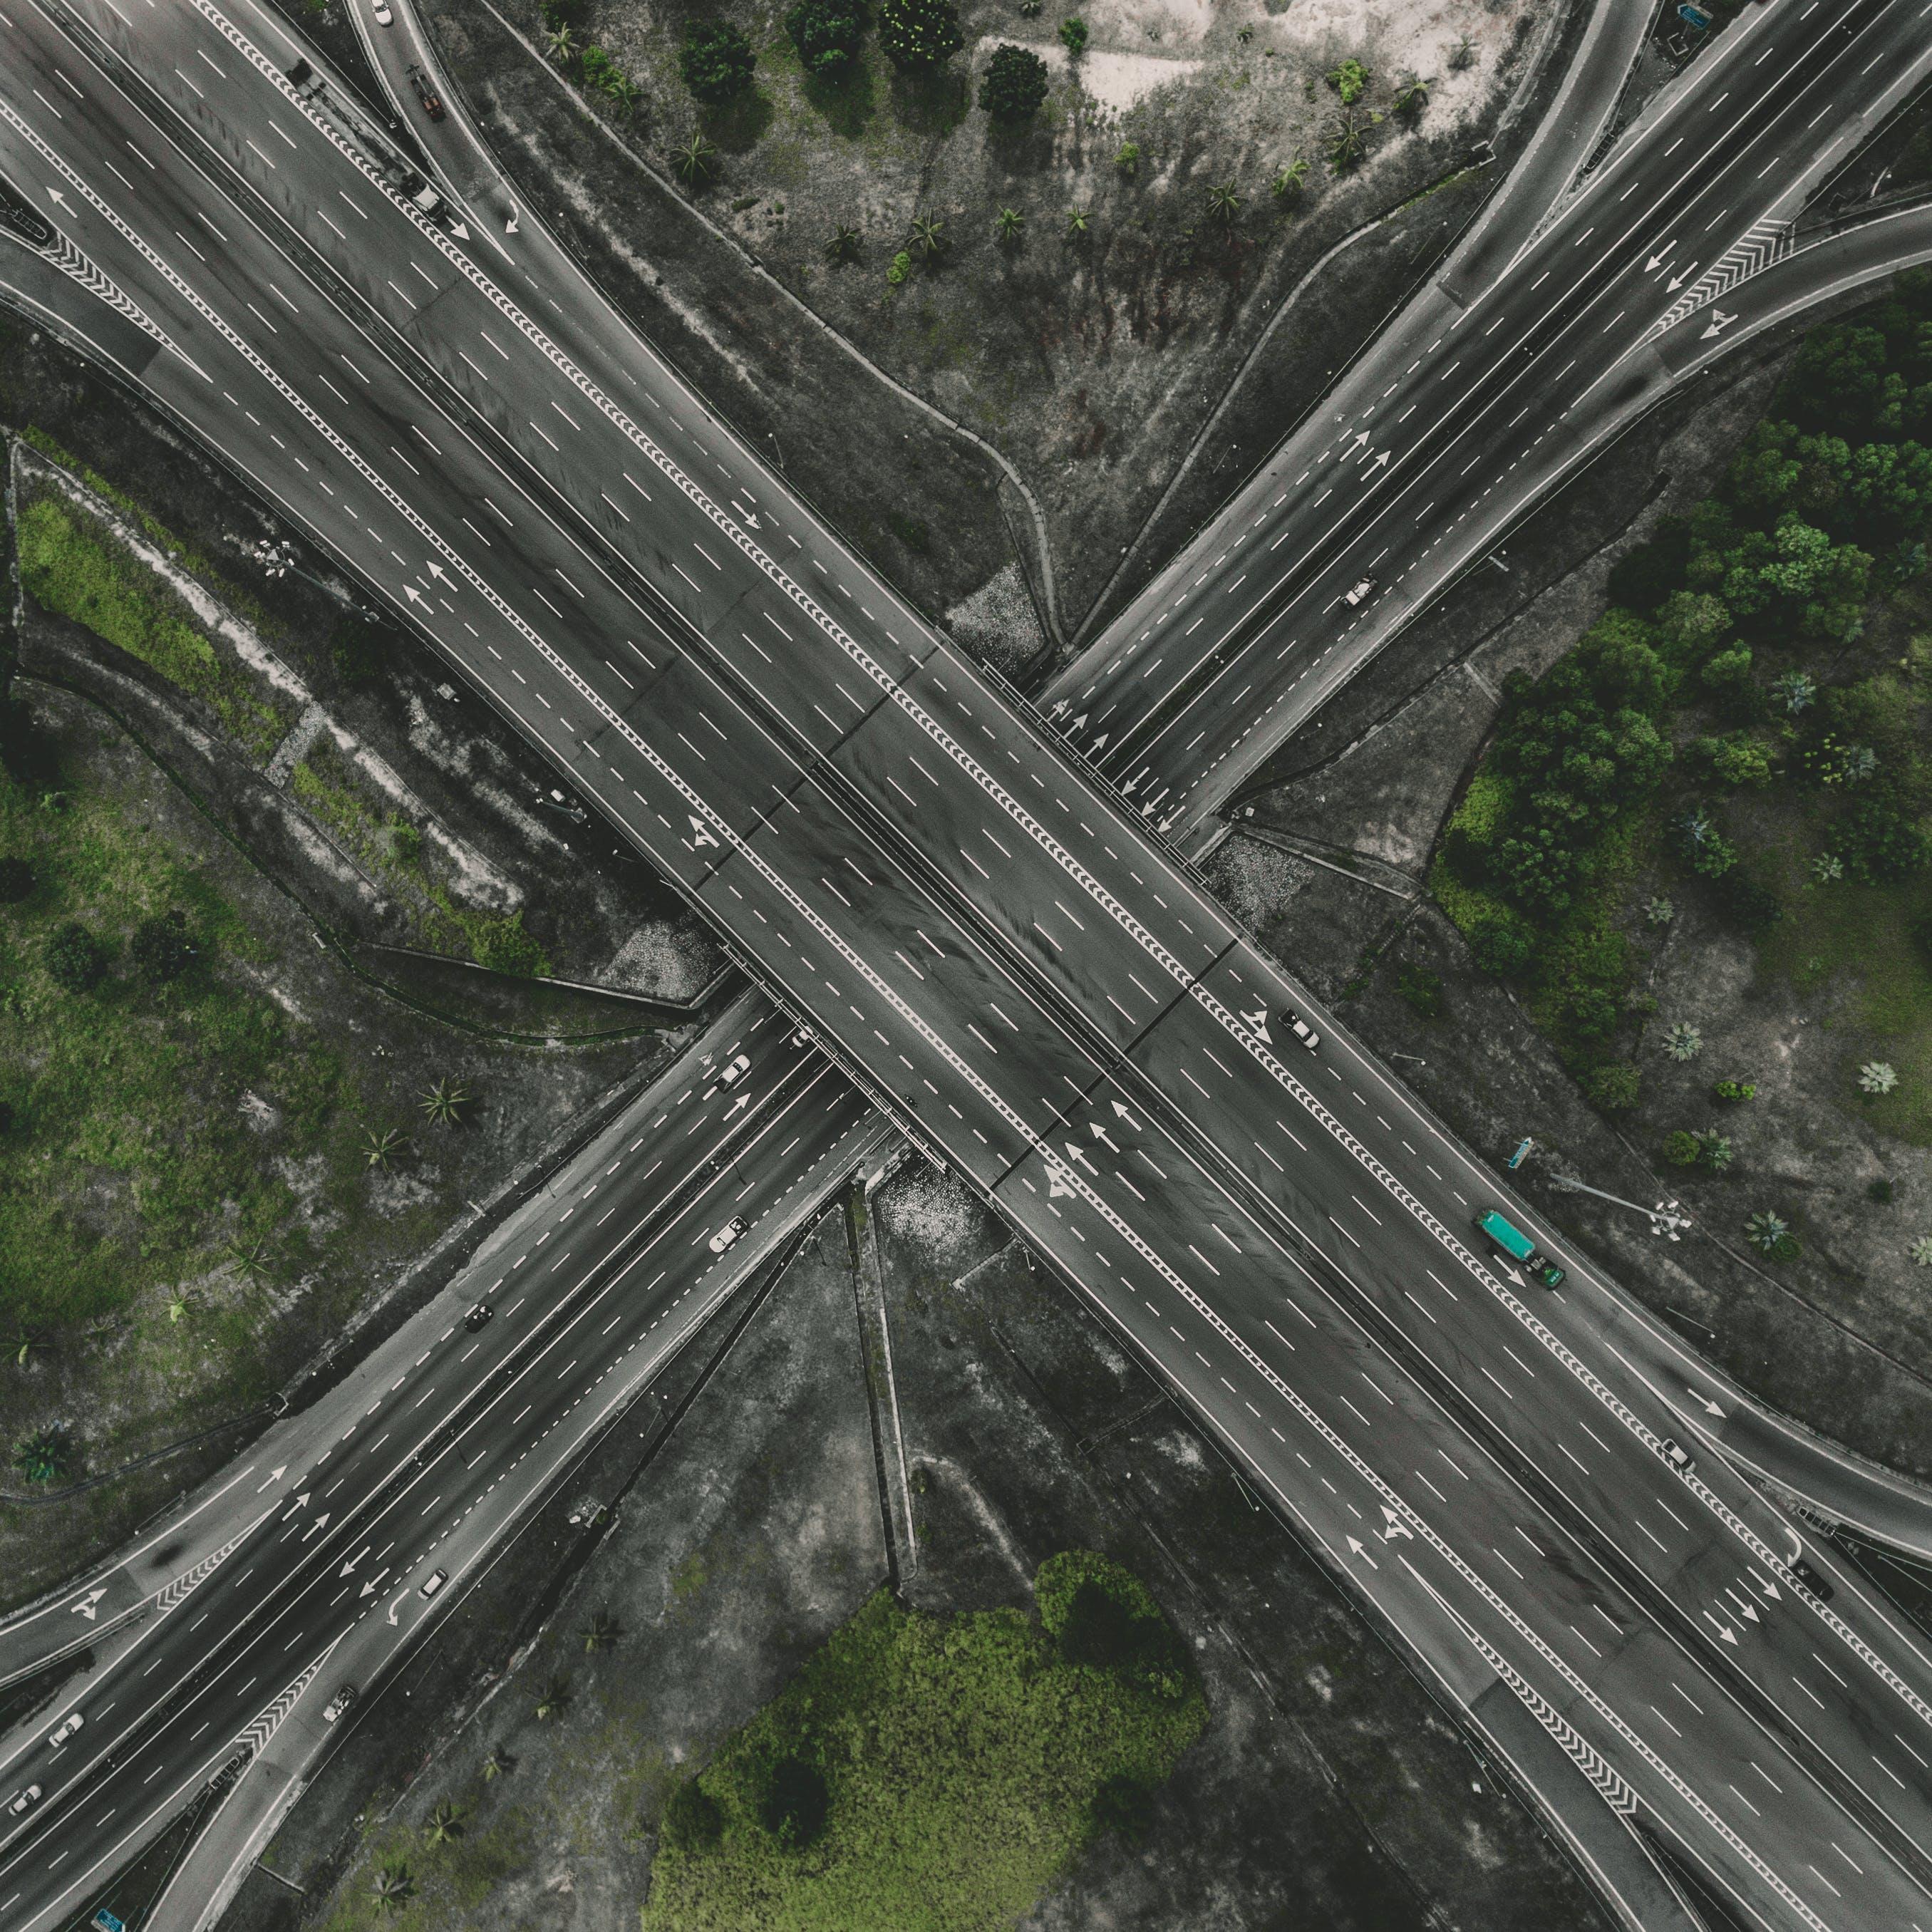 Aerial Photo of Gray Concrete Road